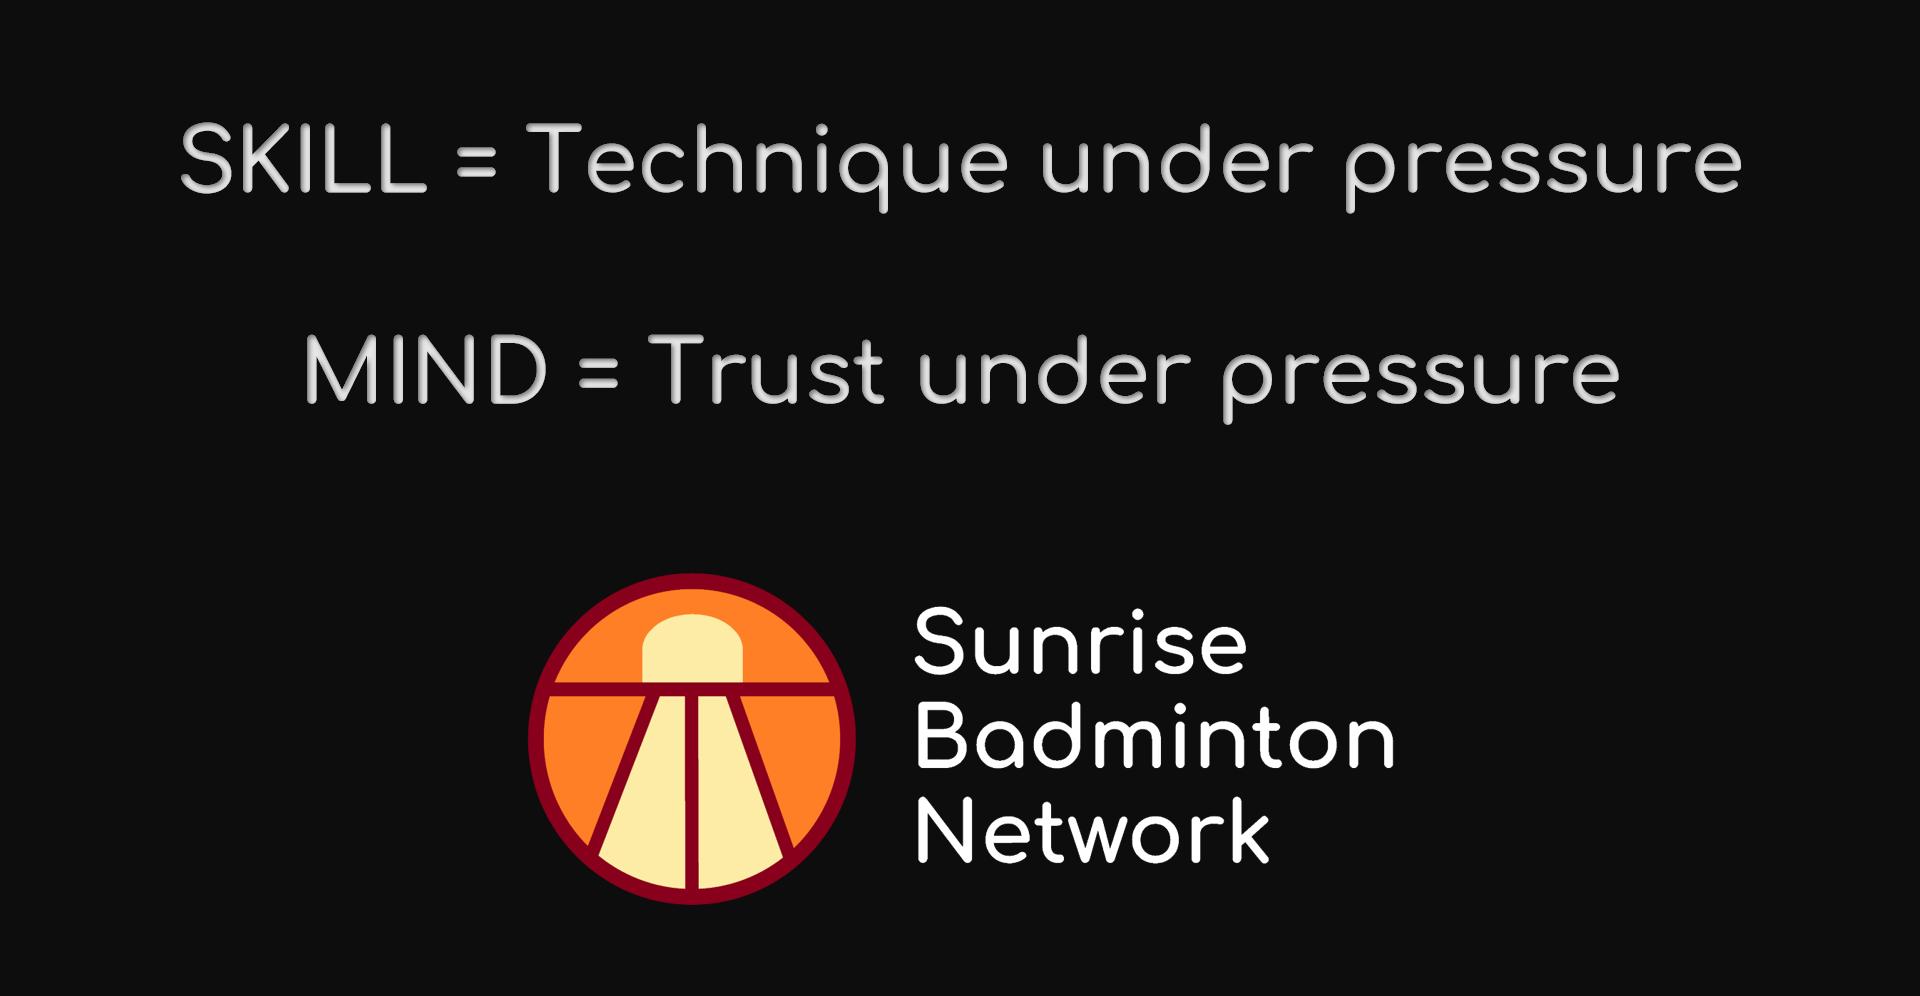 Skillset-Mindset-Badminton-Sunrise-Warrington